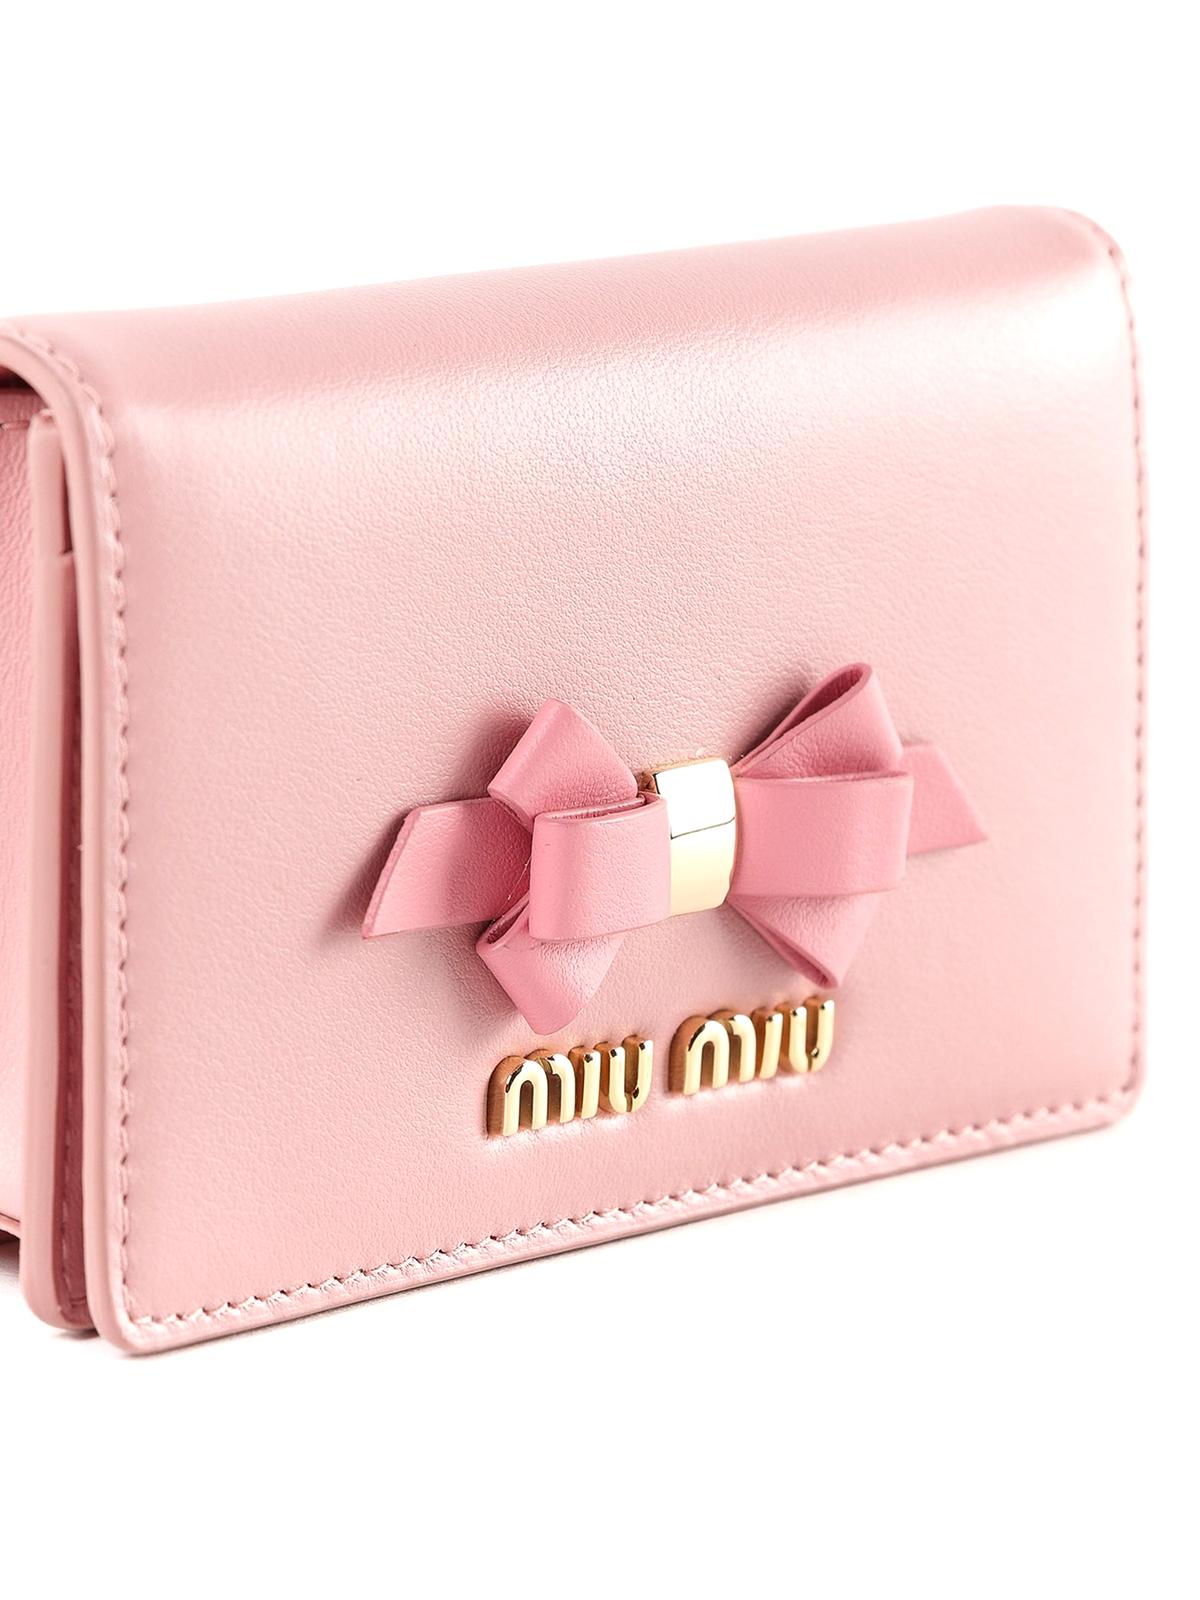 0345e6e3f Miu Miu - Candy pink leather bow wallet clutch - clutches ...